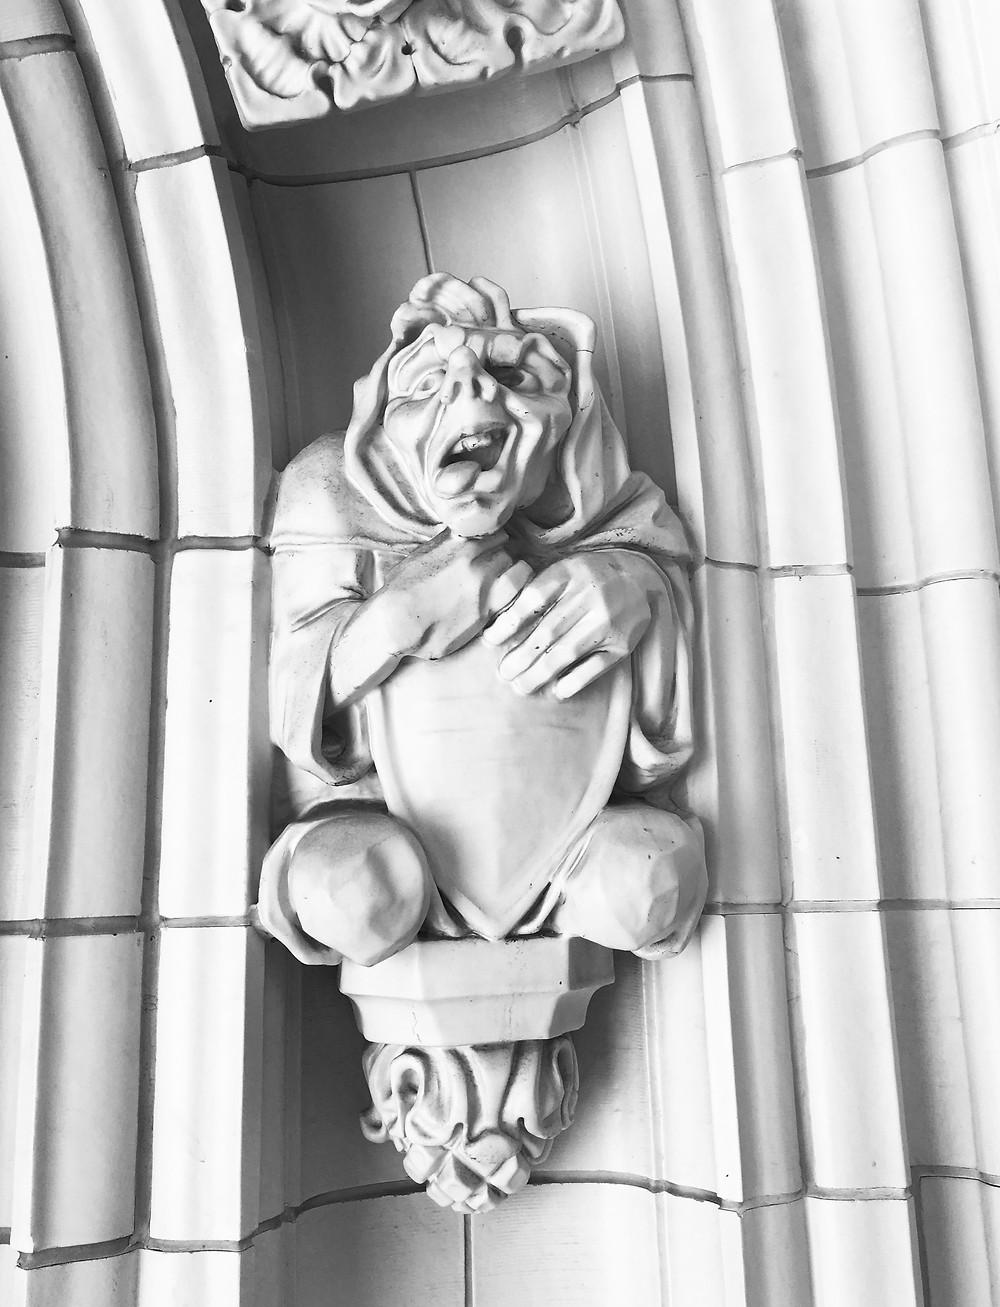 A creepy gargoyle at the City College of New York